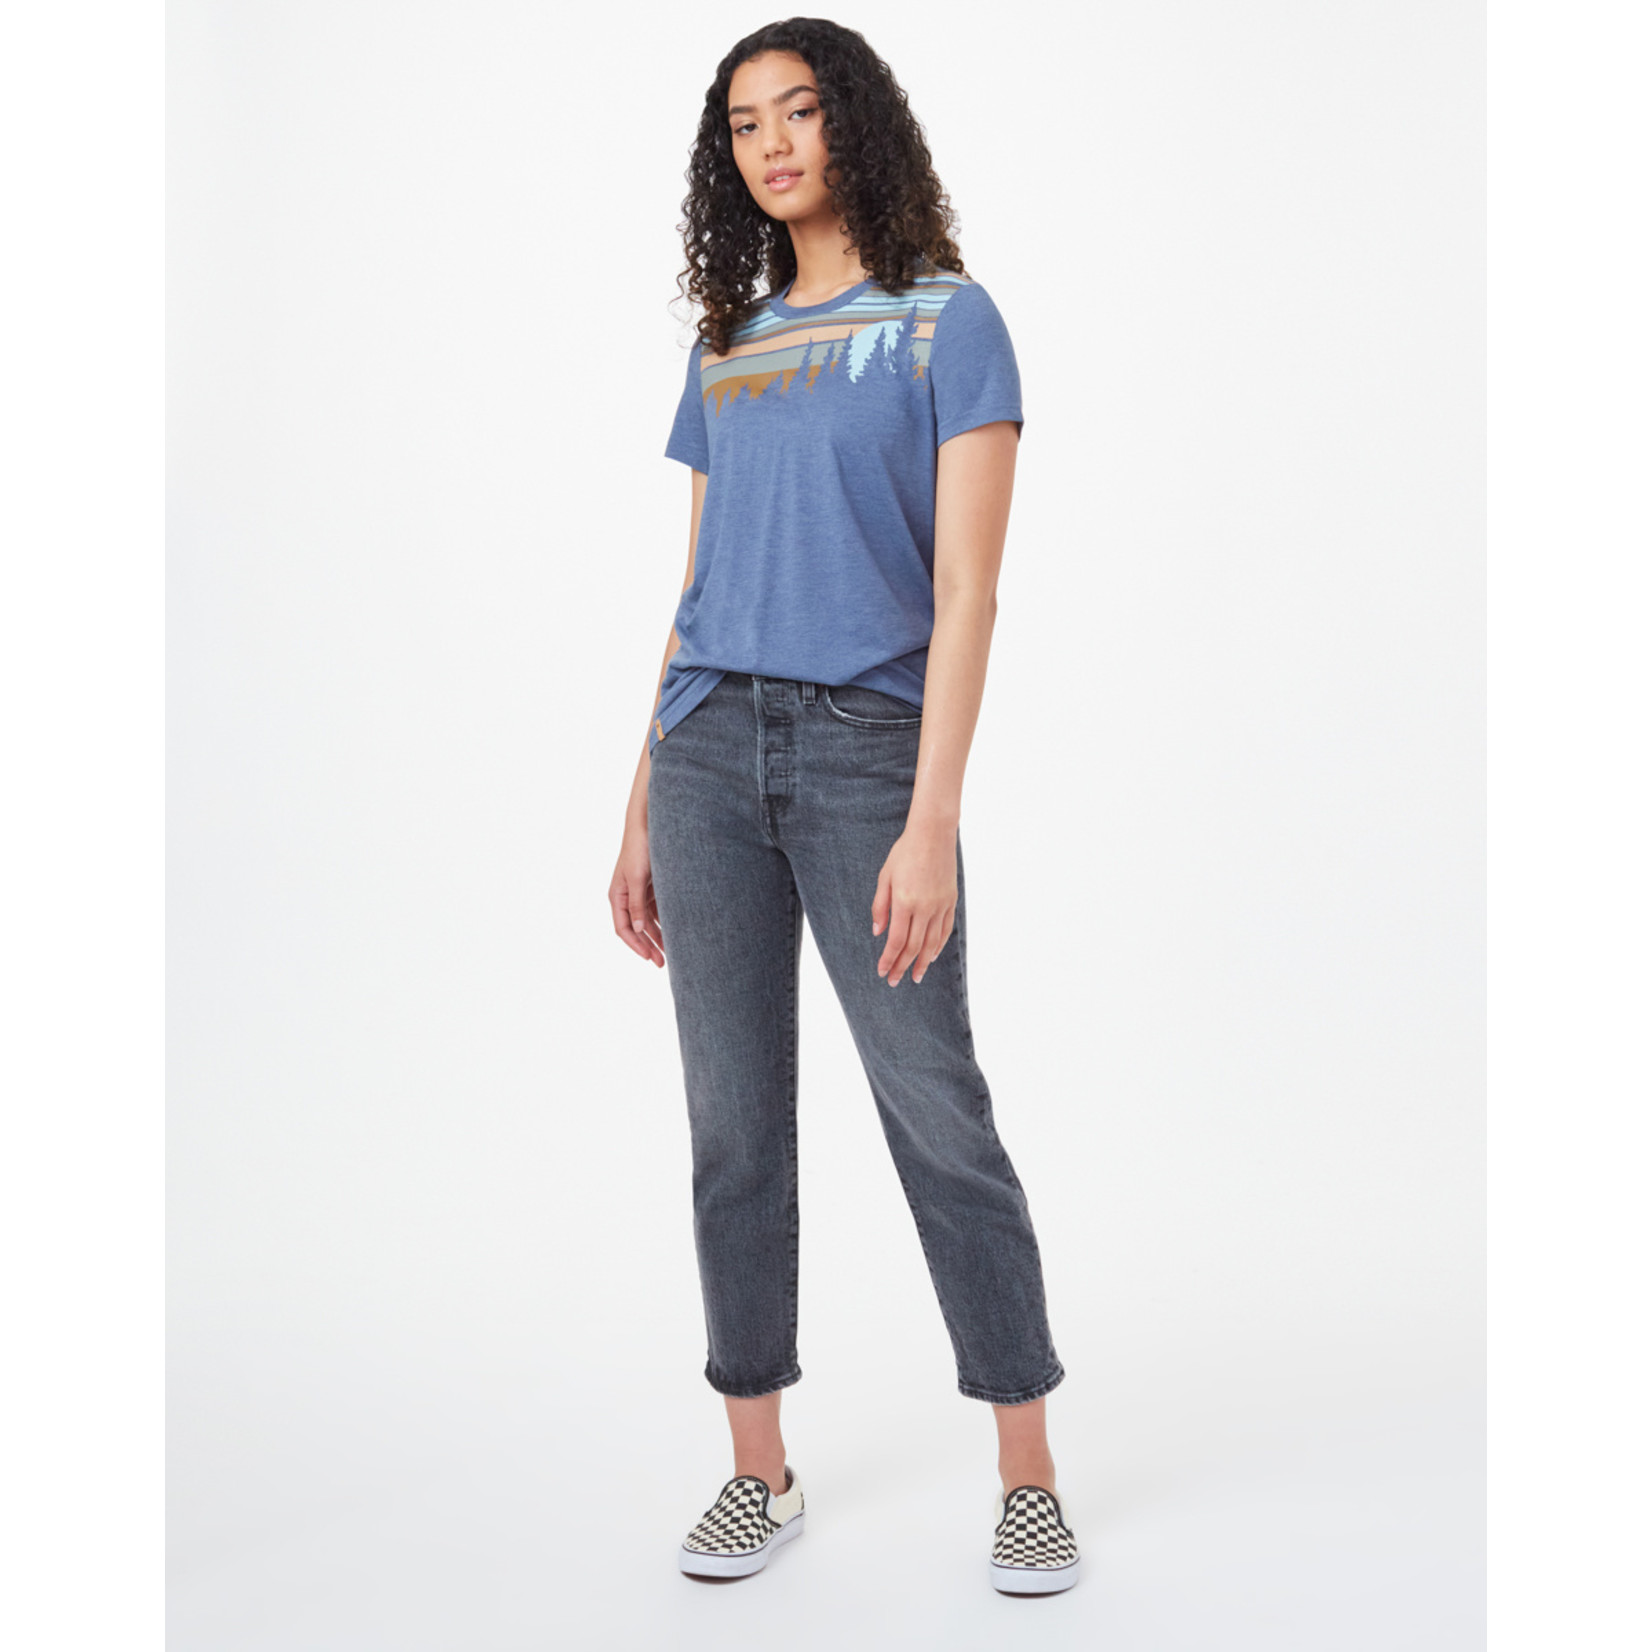 tentree® Women Retro Juniper Classic T-Shirt